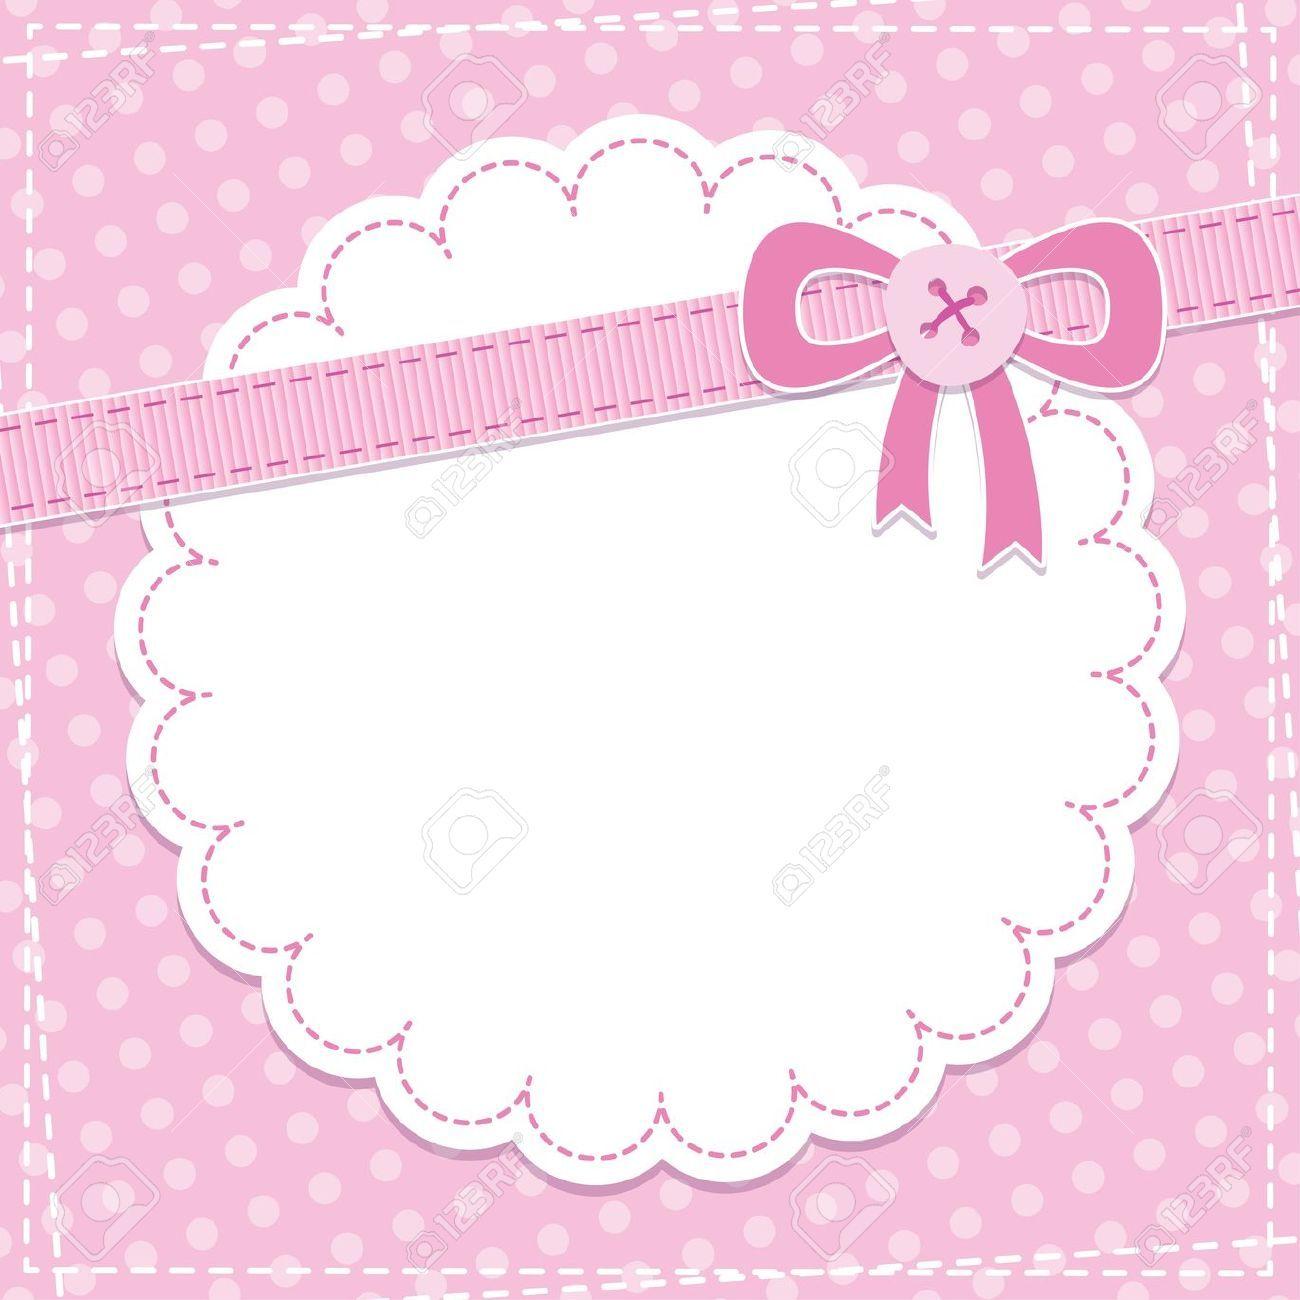 Fondos Rosados Para Baby Shower Buscar Con Google Baby Shower